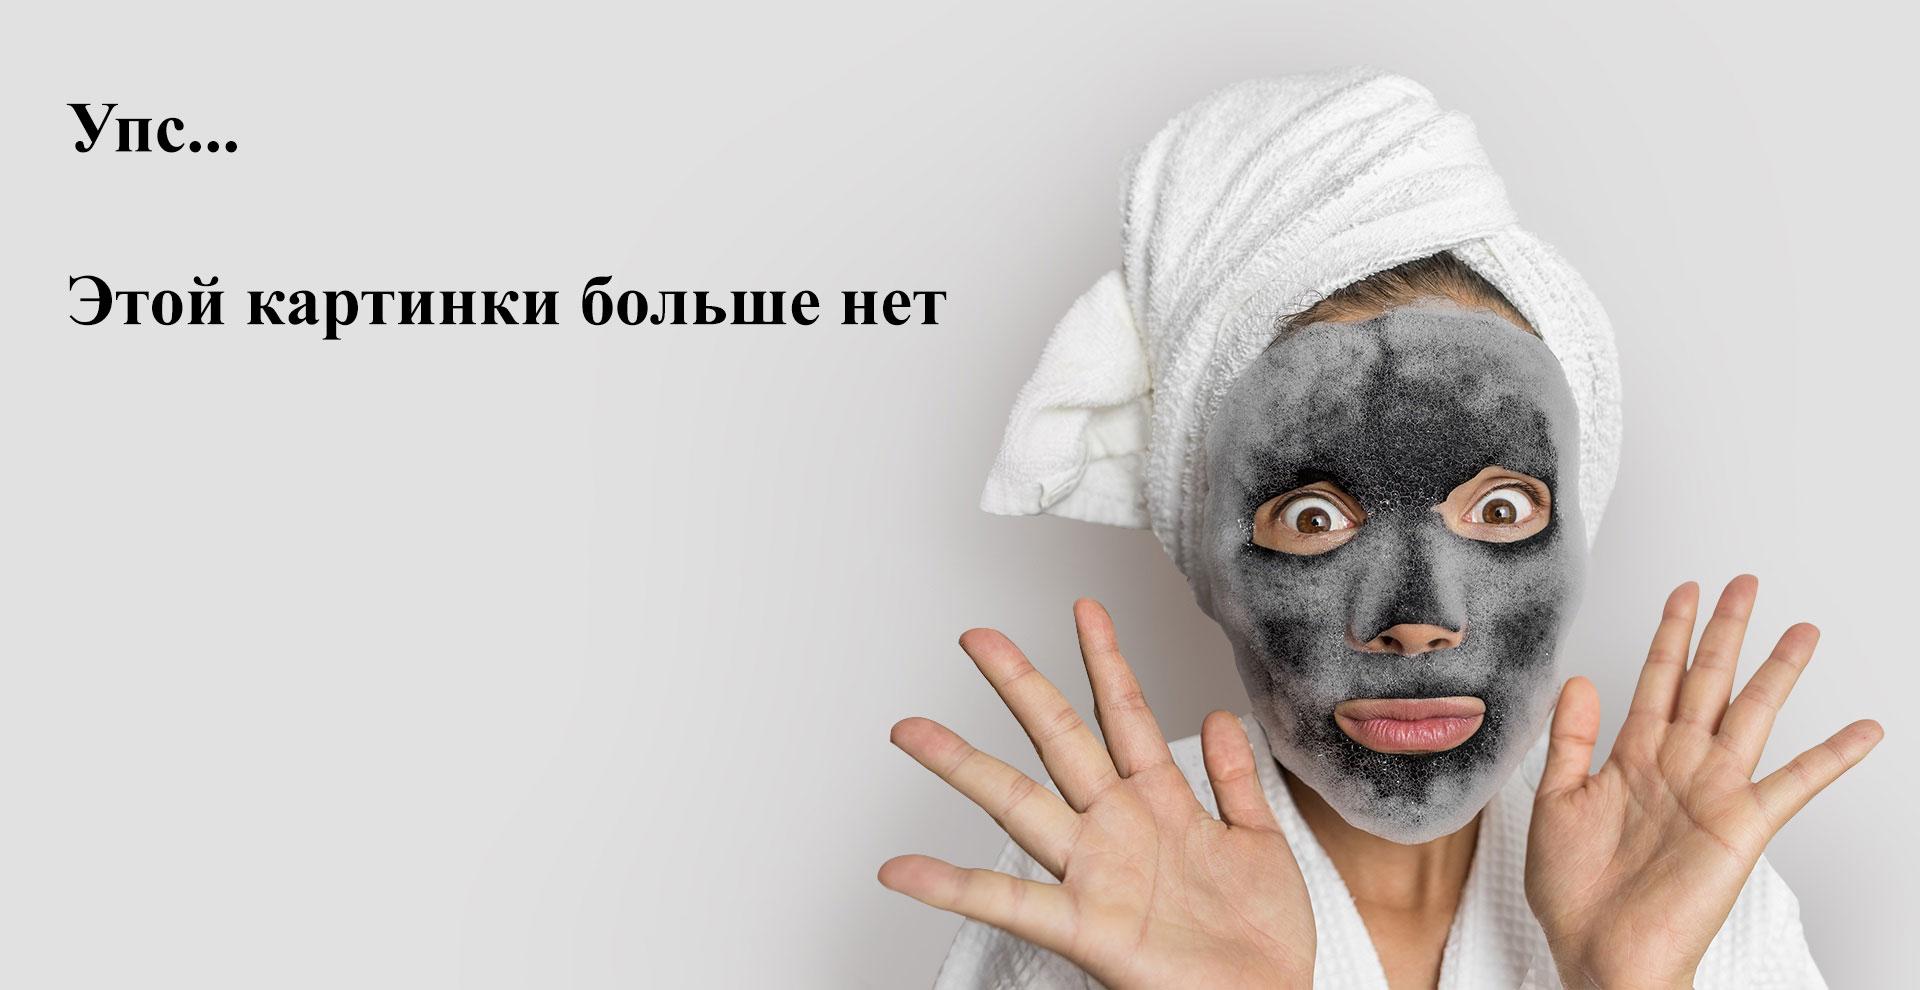 Луи Филипп, Топ для гель-лака Glitter №2, 15 мл